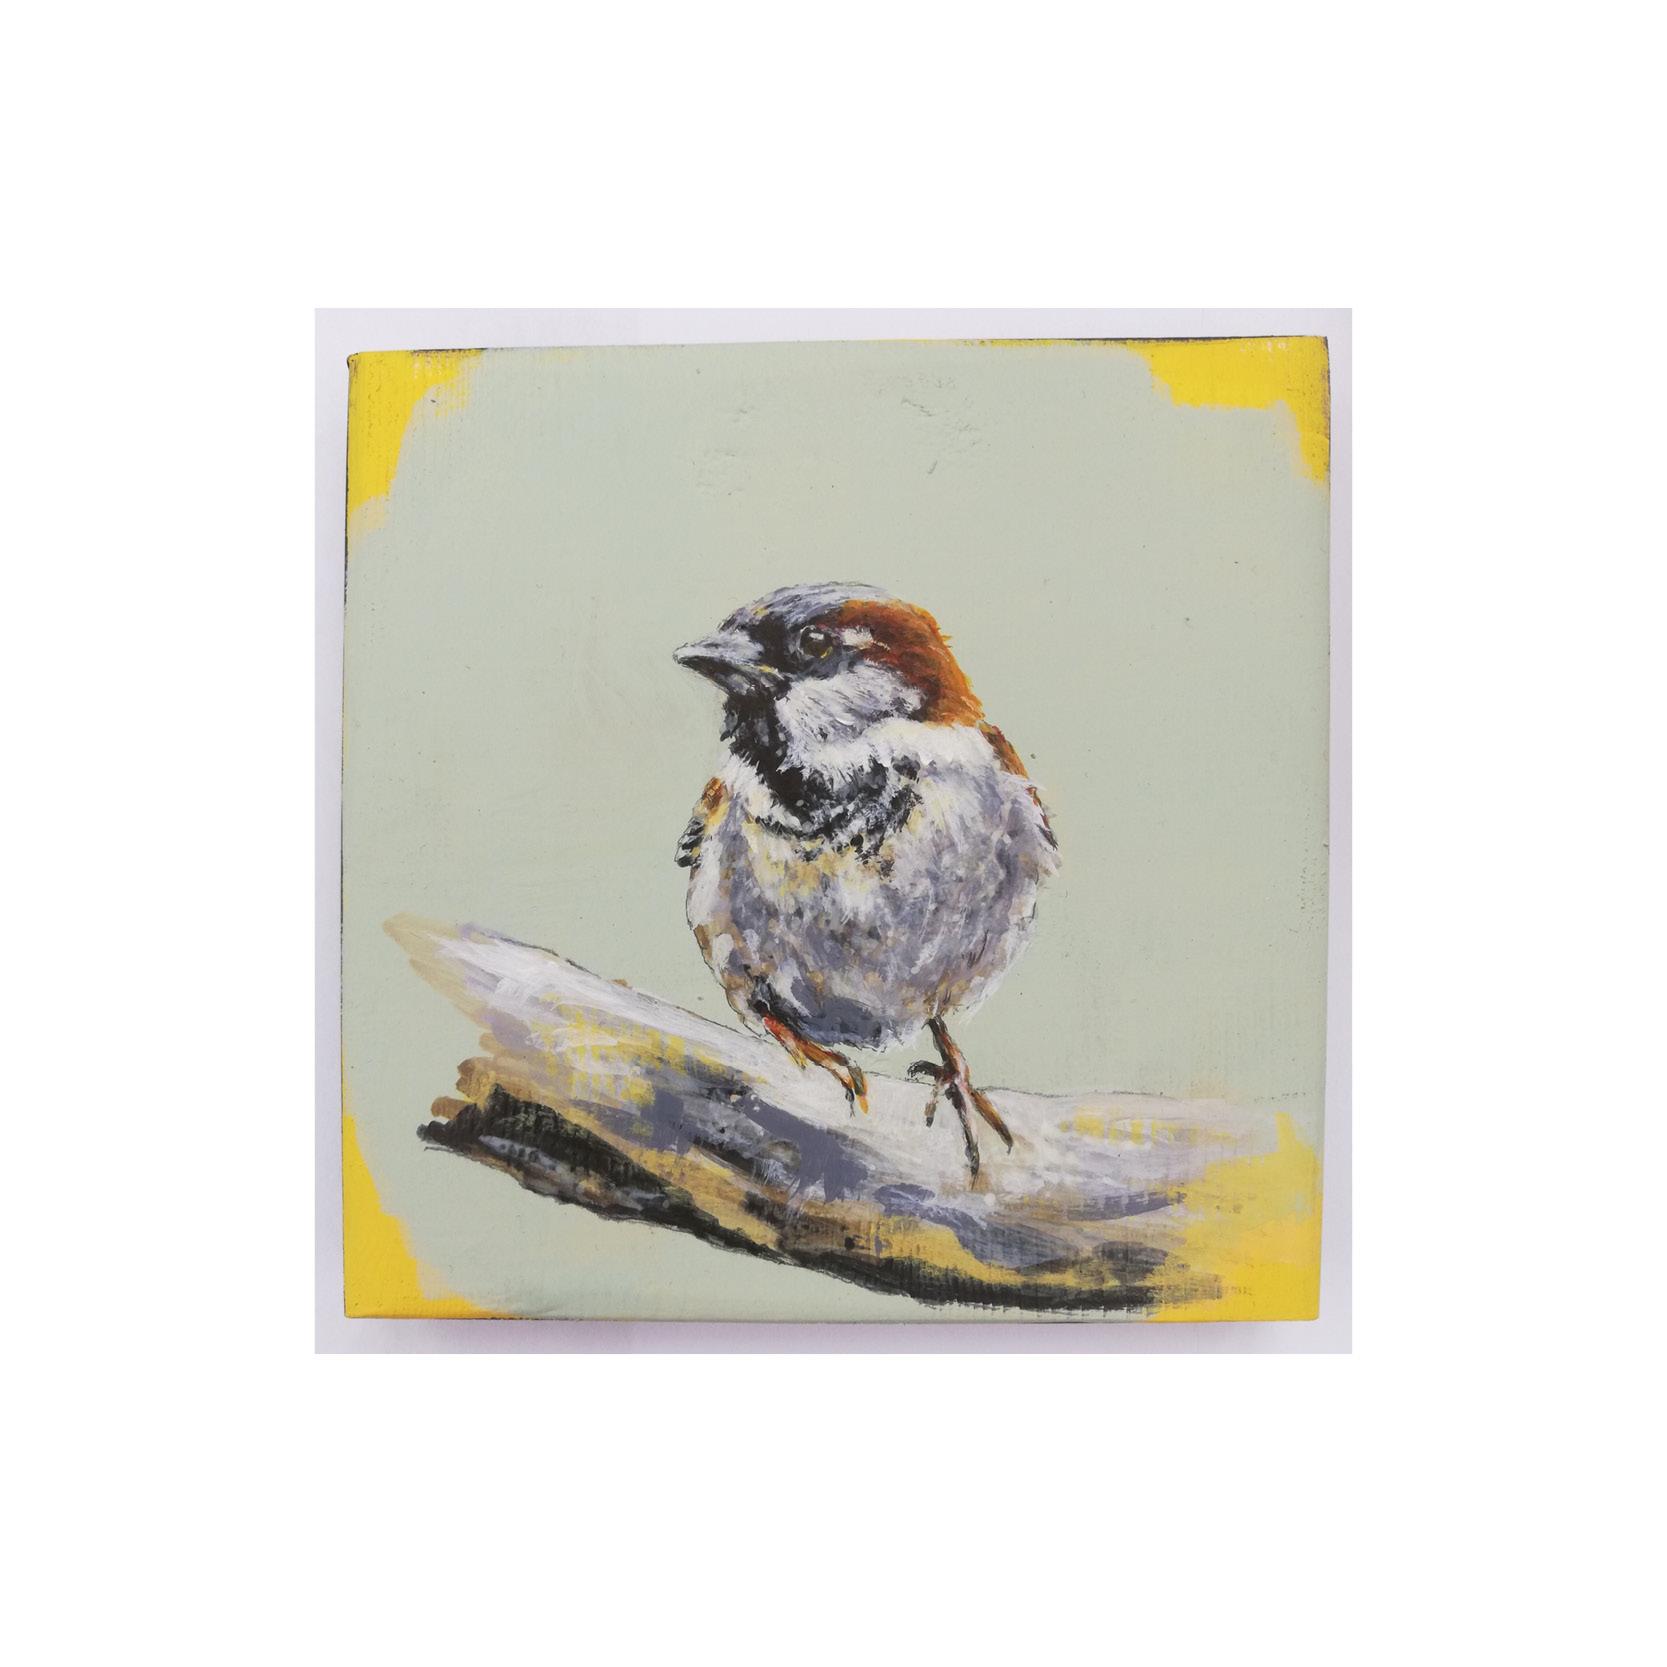 Steve Ferguson - Sparrow on Branch